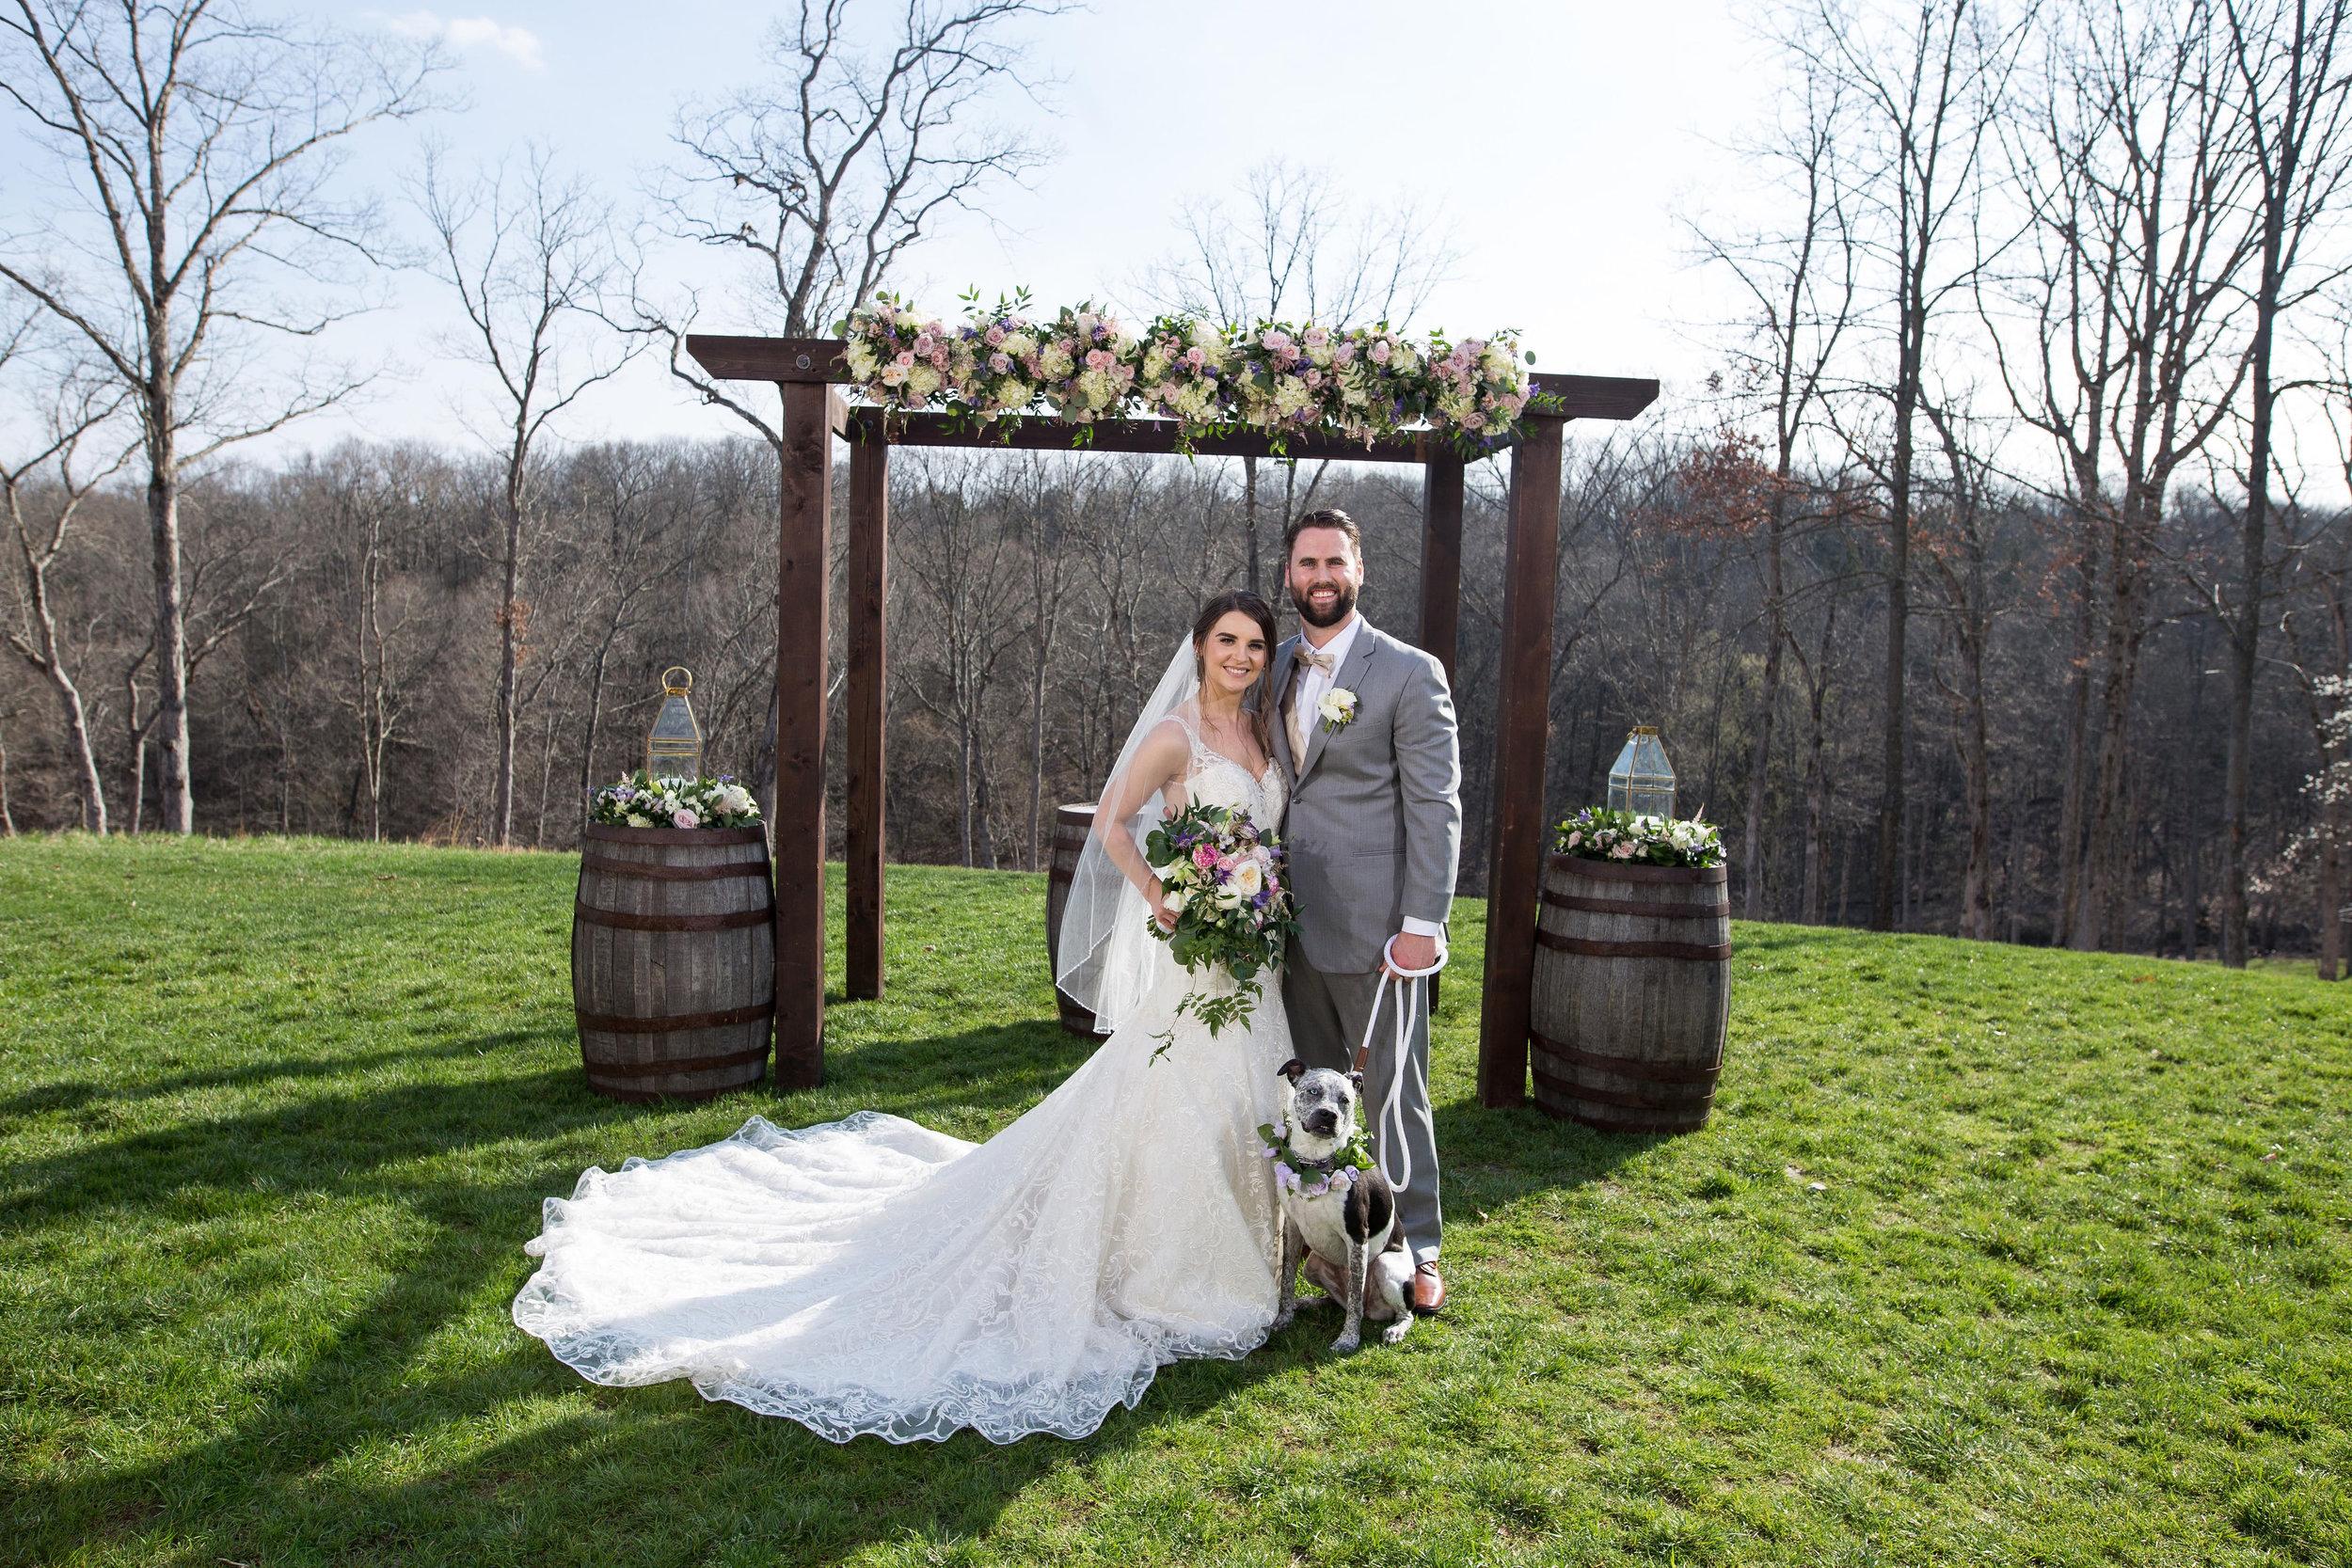 453_Jessica&Stephen_FamilyFormals_AlohaKellyPhotography.jpg